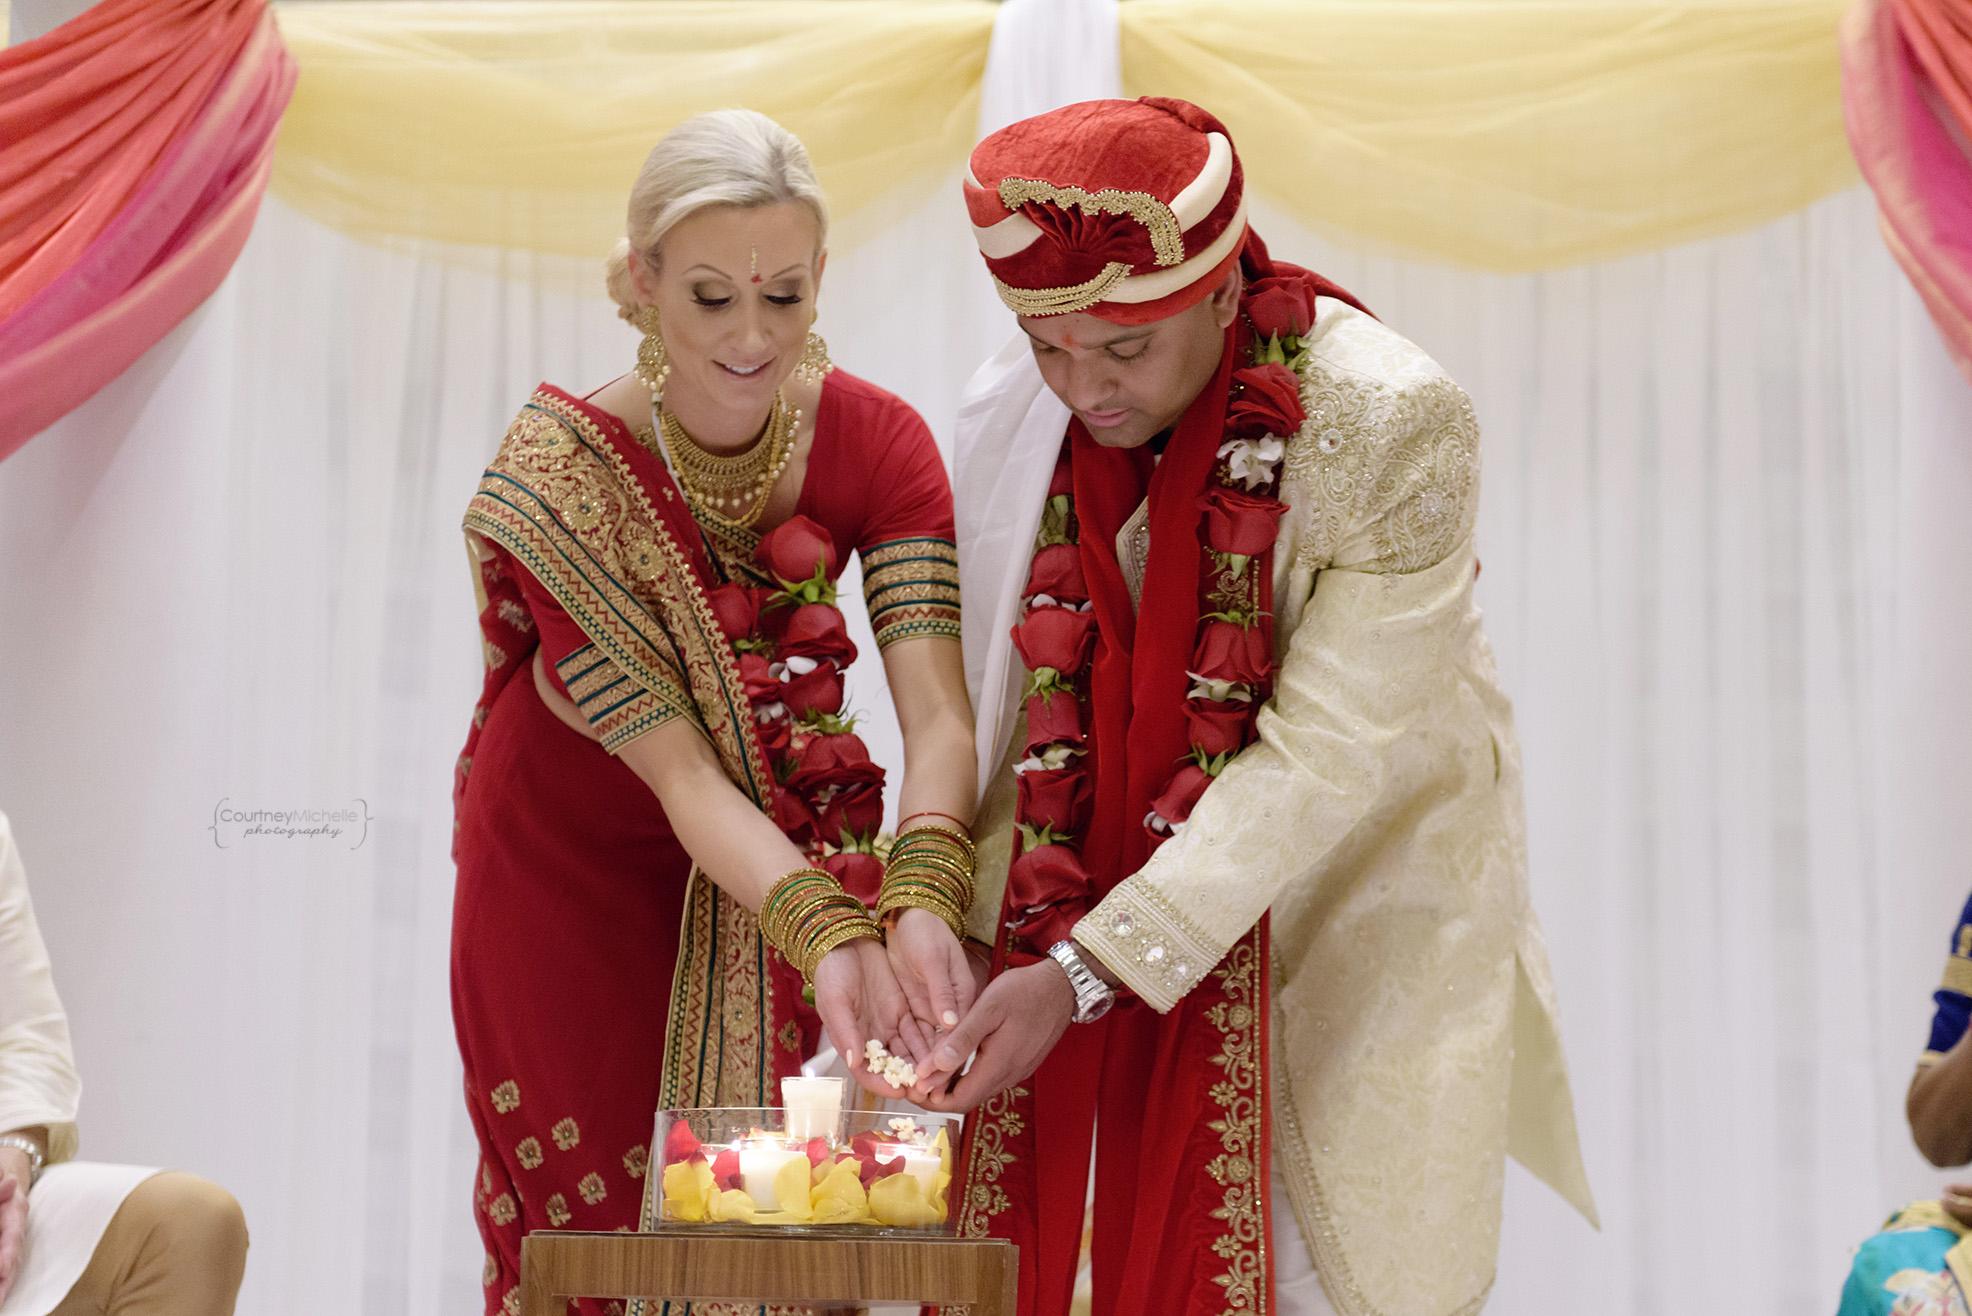 hindu-ceremony-grand-cayman-ritz-carlton-wedding©CopyrightCMP-LeaAnneRaj-7183.jpg